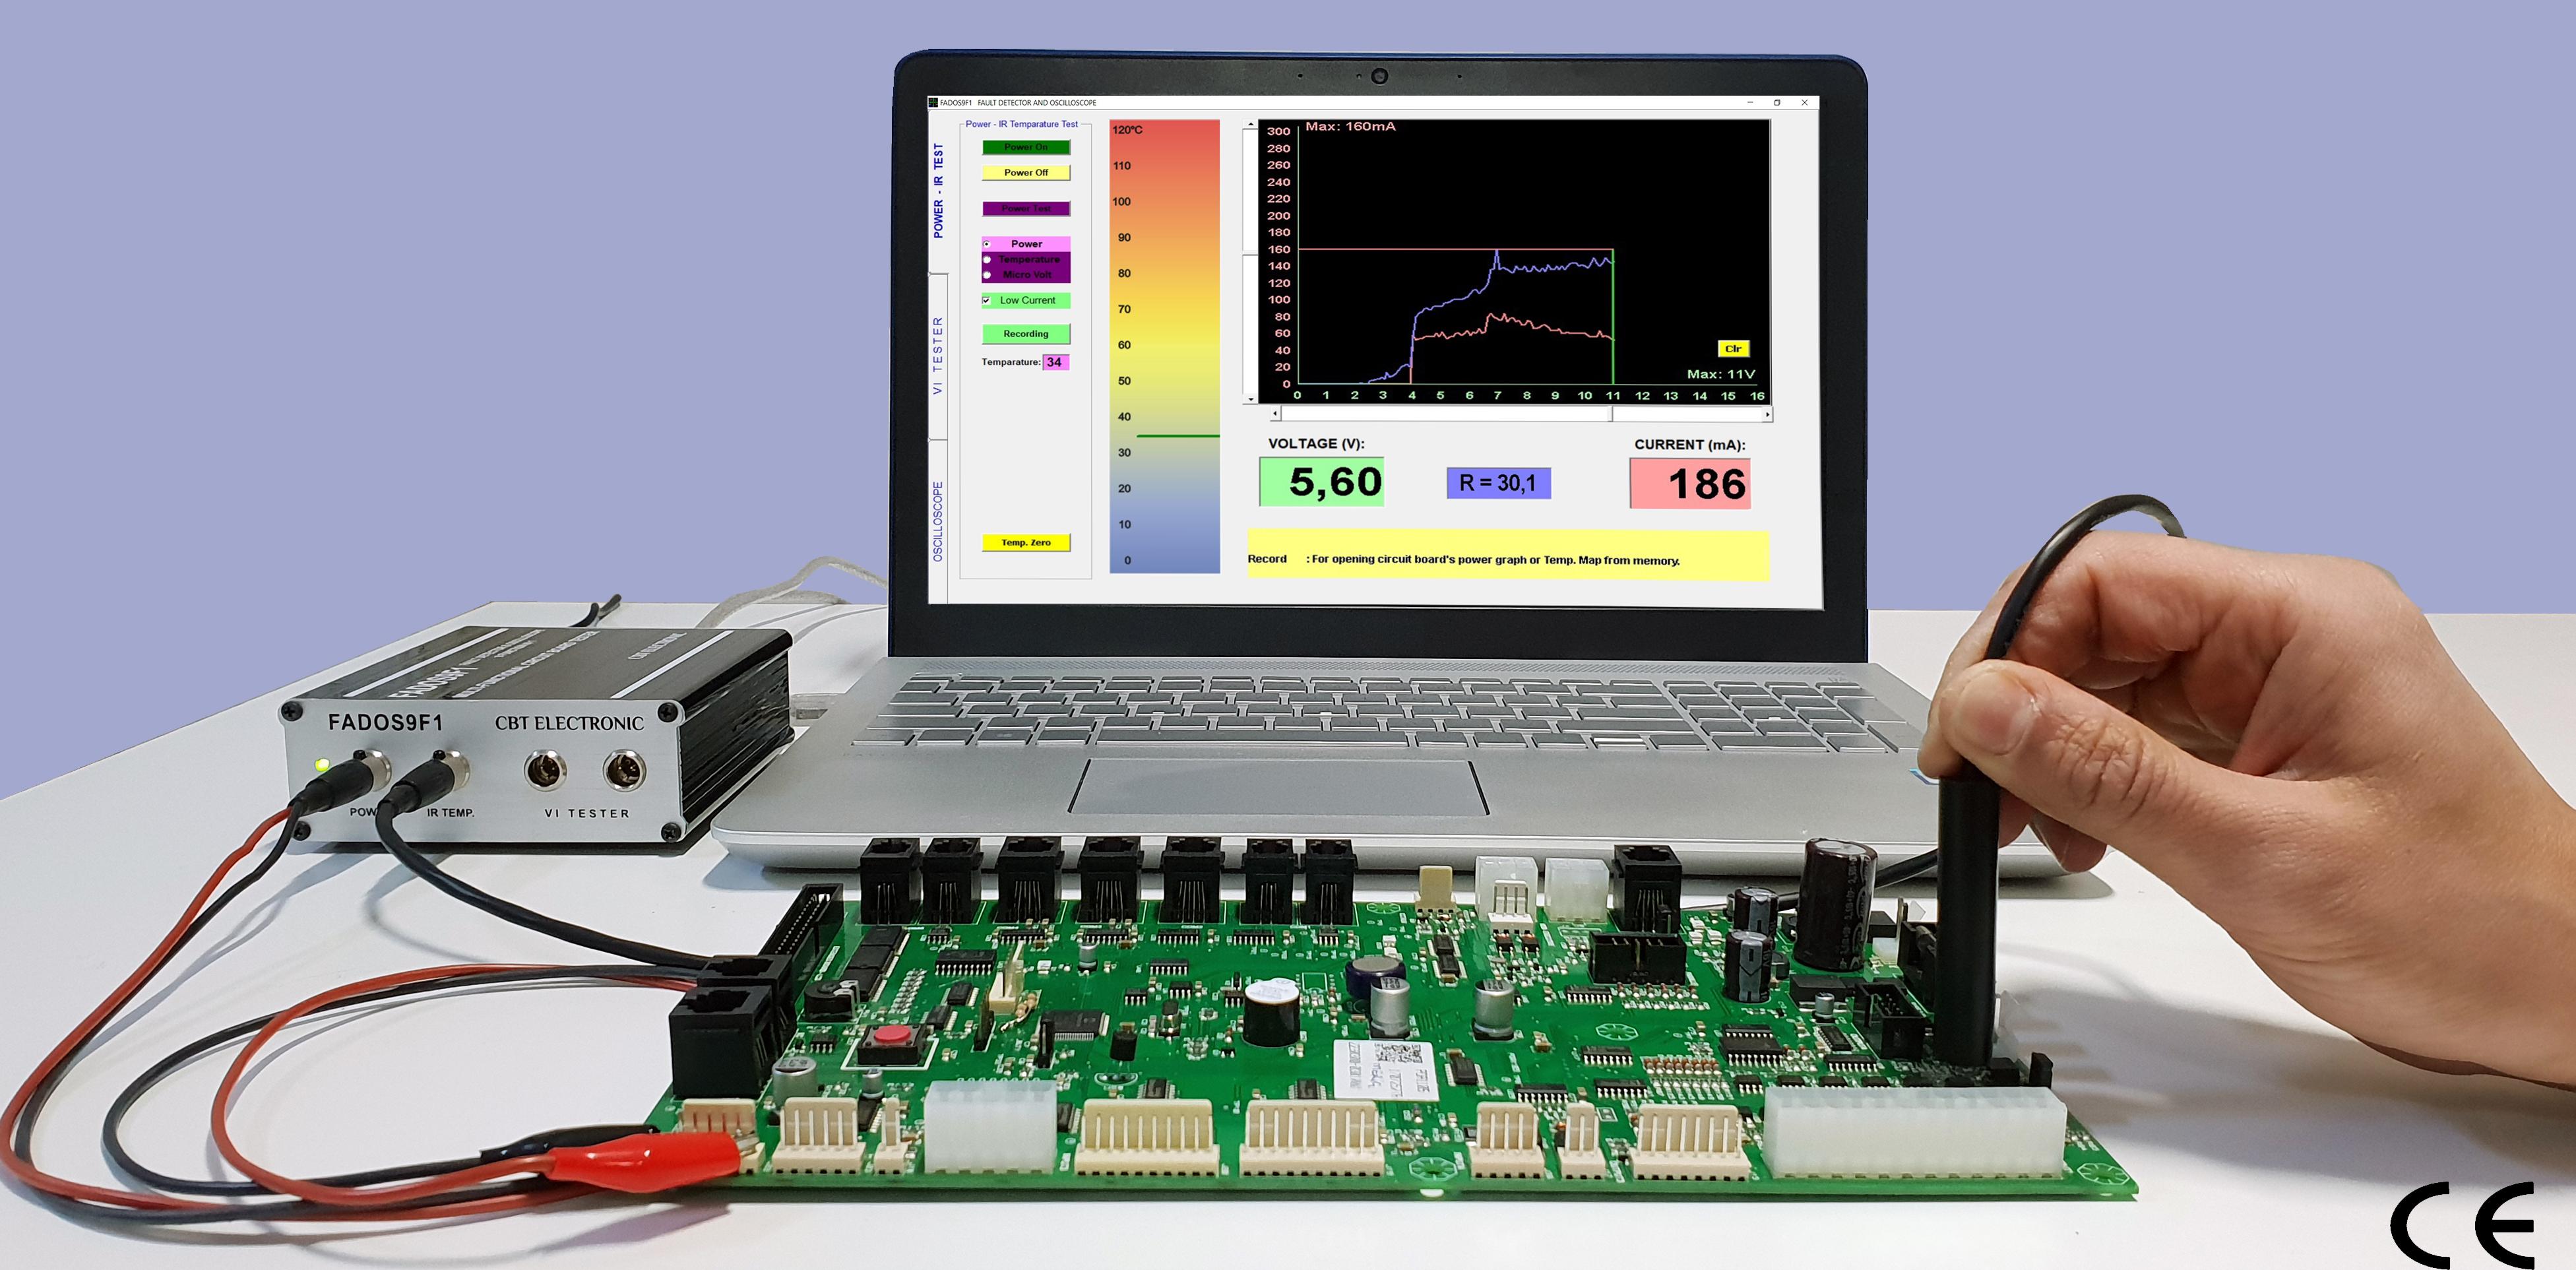 Power - IR Temperature Test